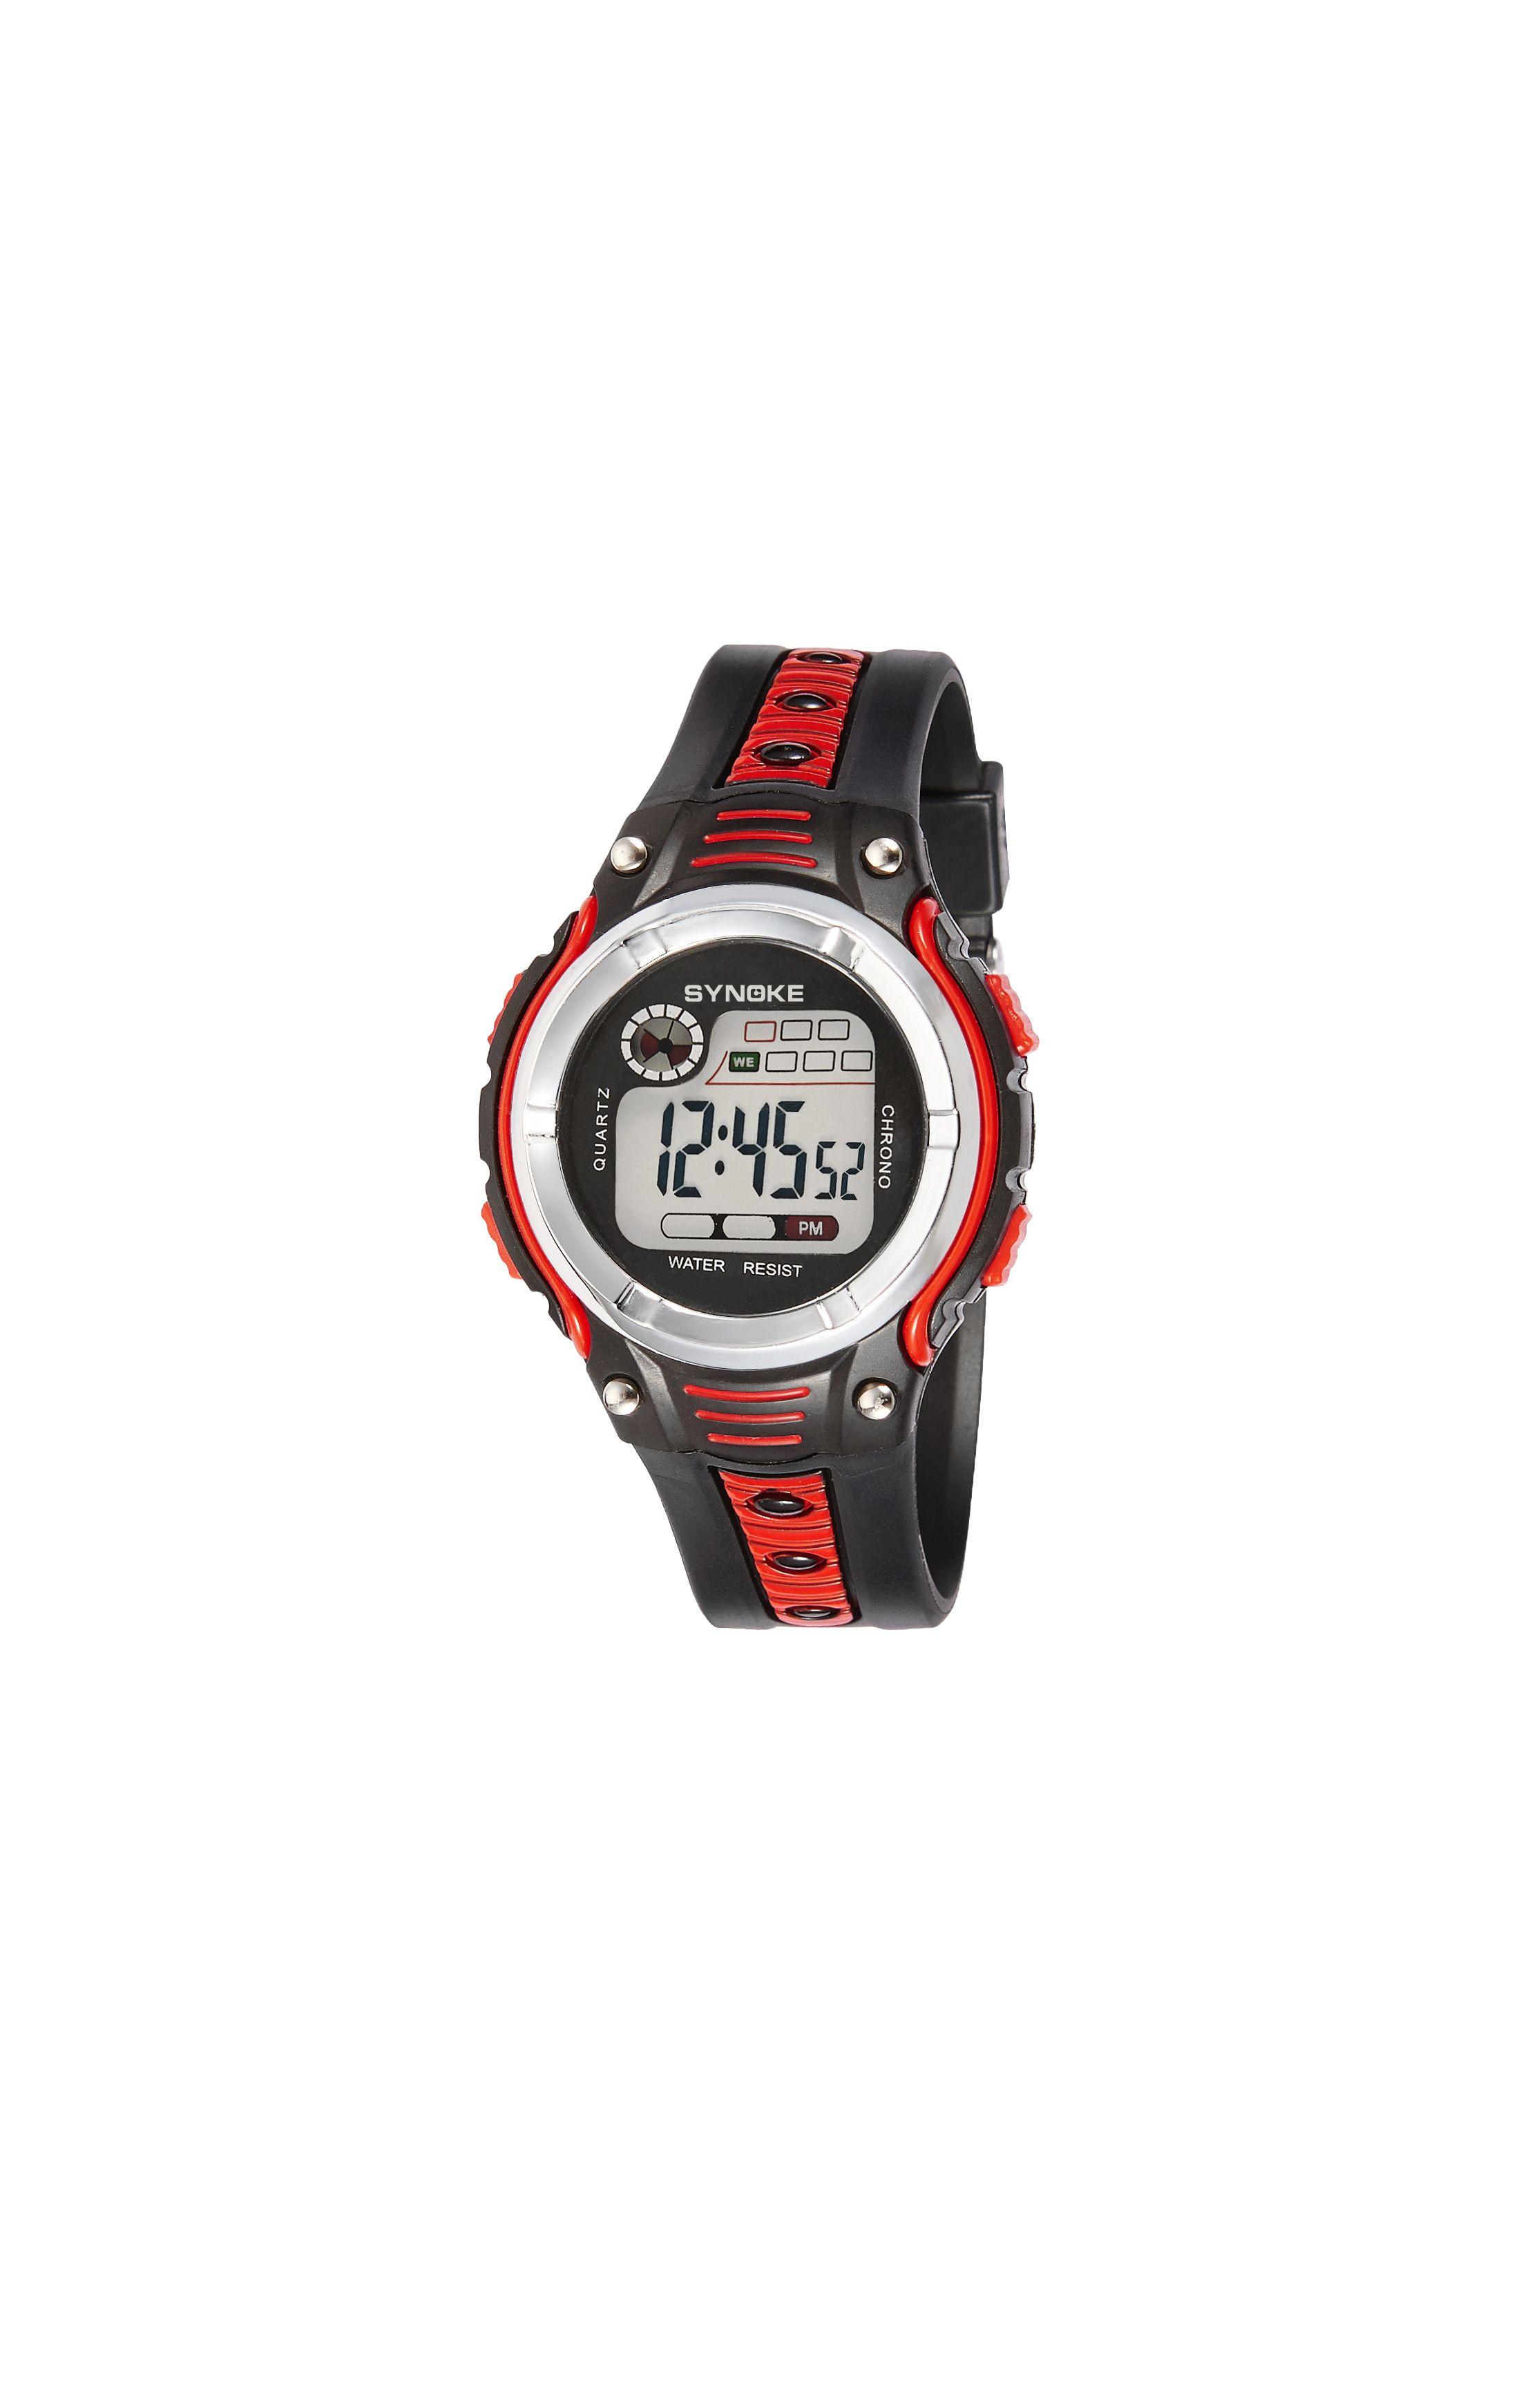 New Fashion Digital Watch 30m Waterproof Watch Colorful Luminous PU Wrist Watch Dual Colors Strap Drop